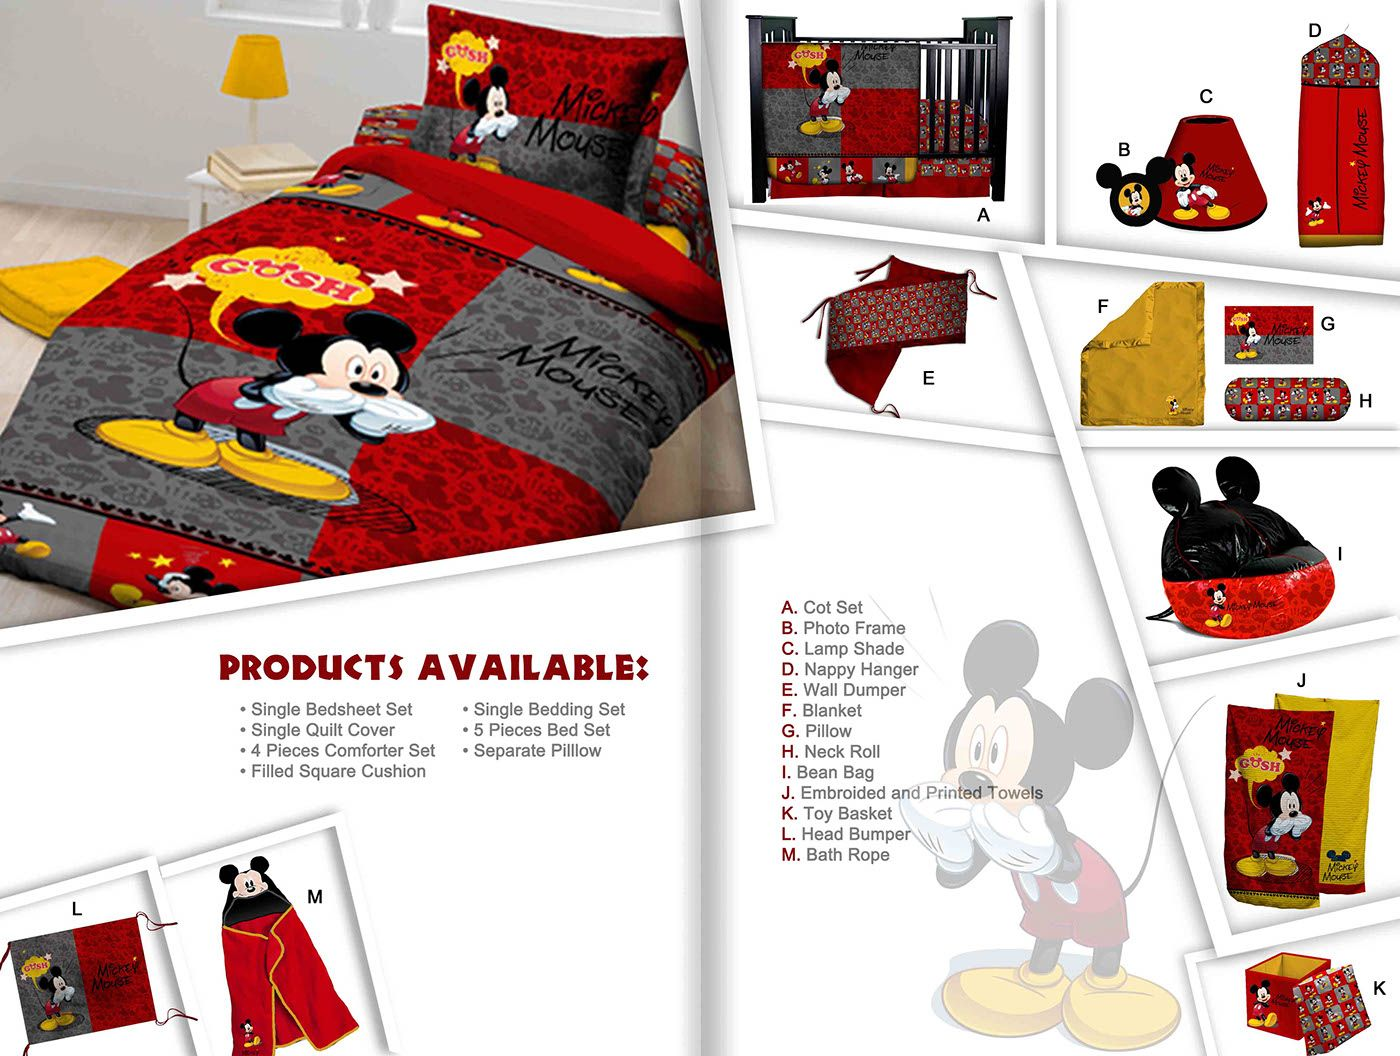 Bedding Catalog Design For Disney On Behance With Images